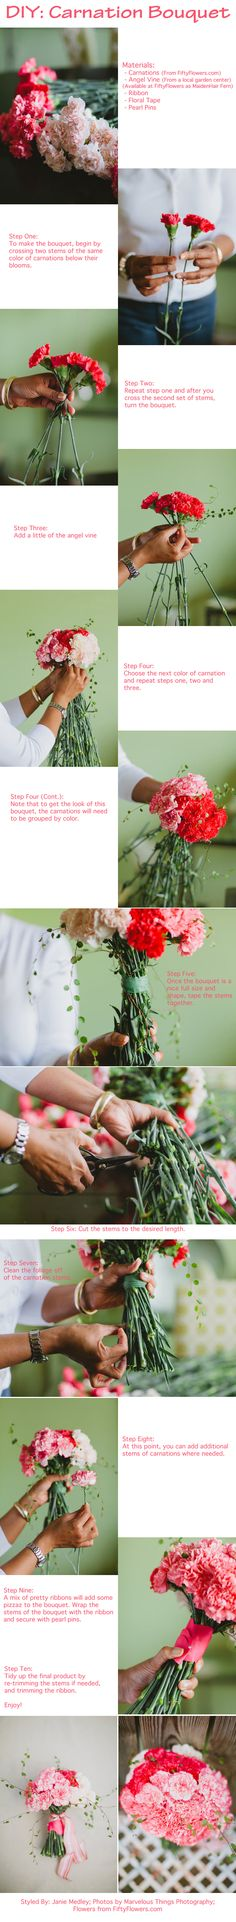 DIY Carnation Bouquet